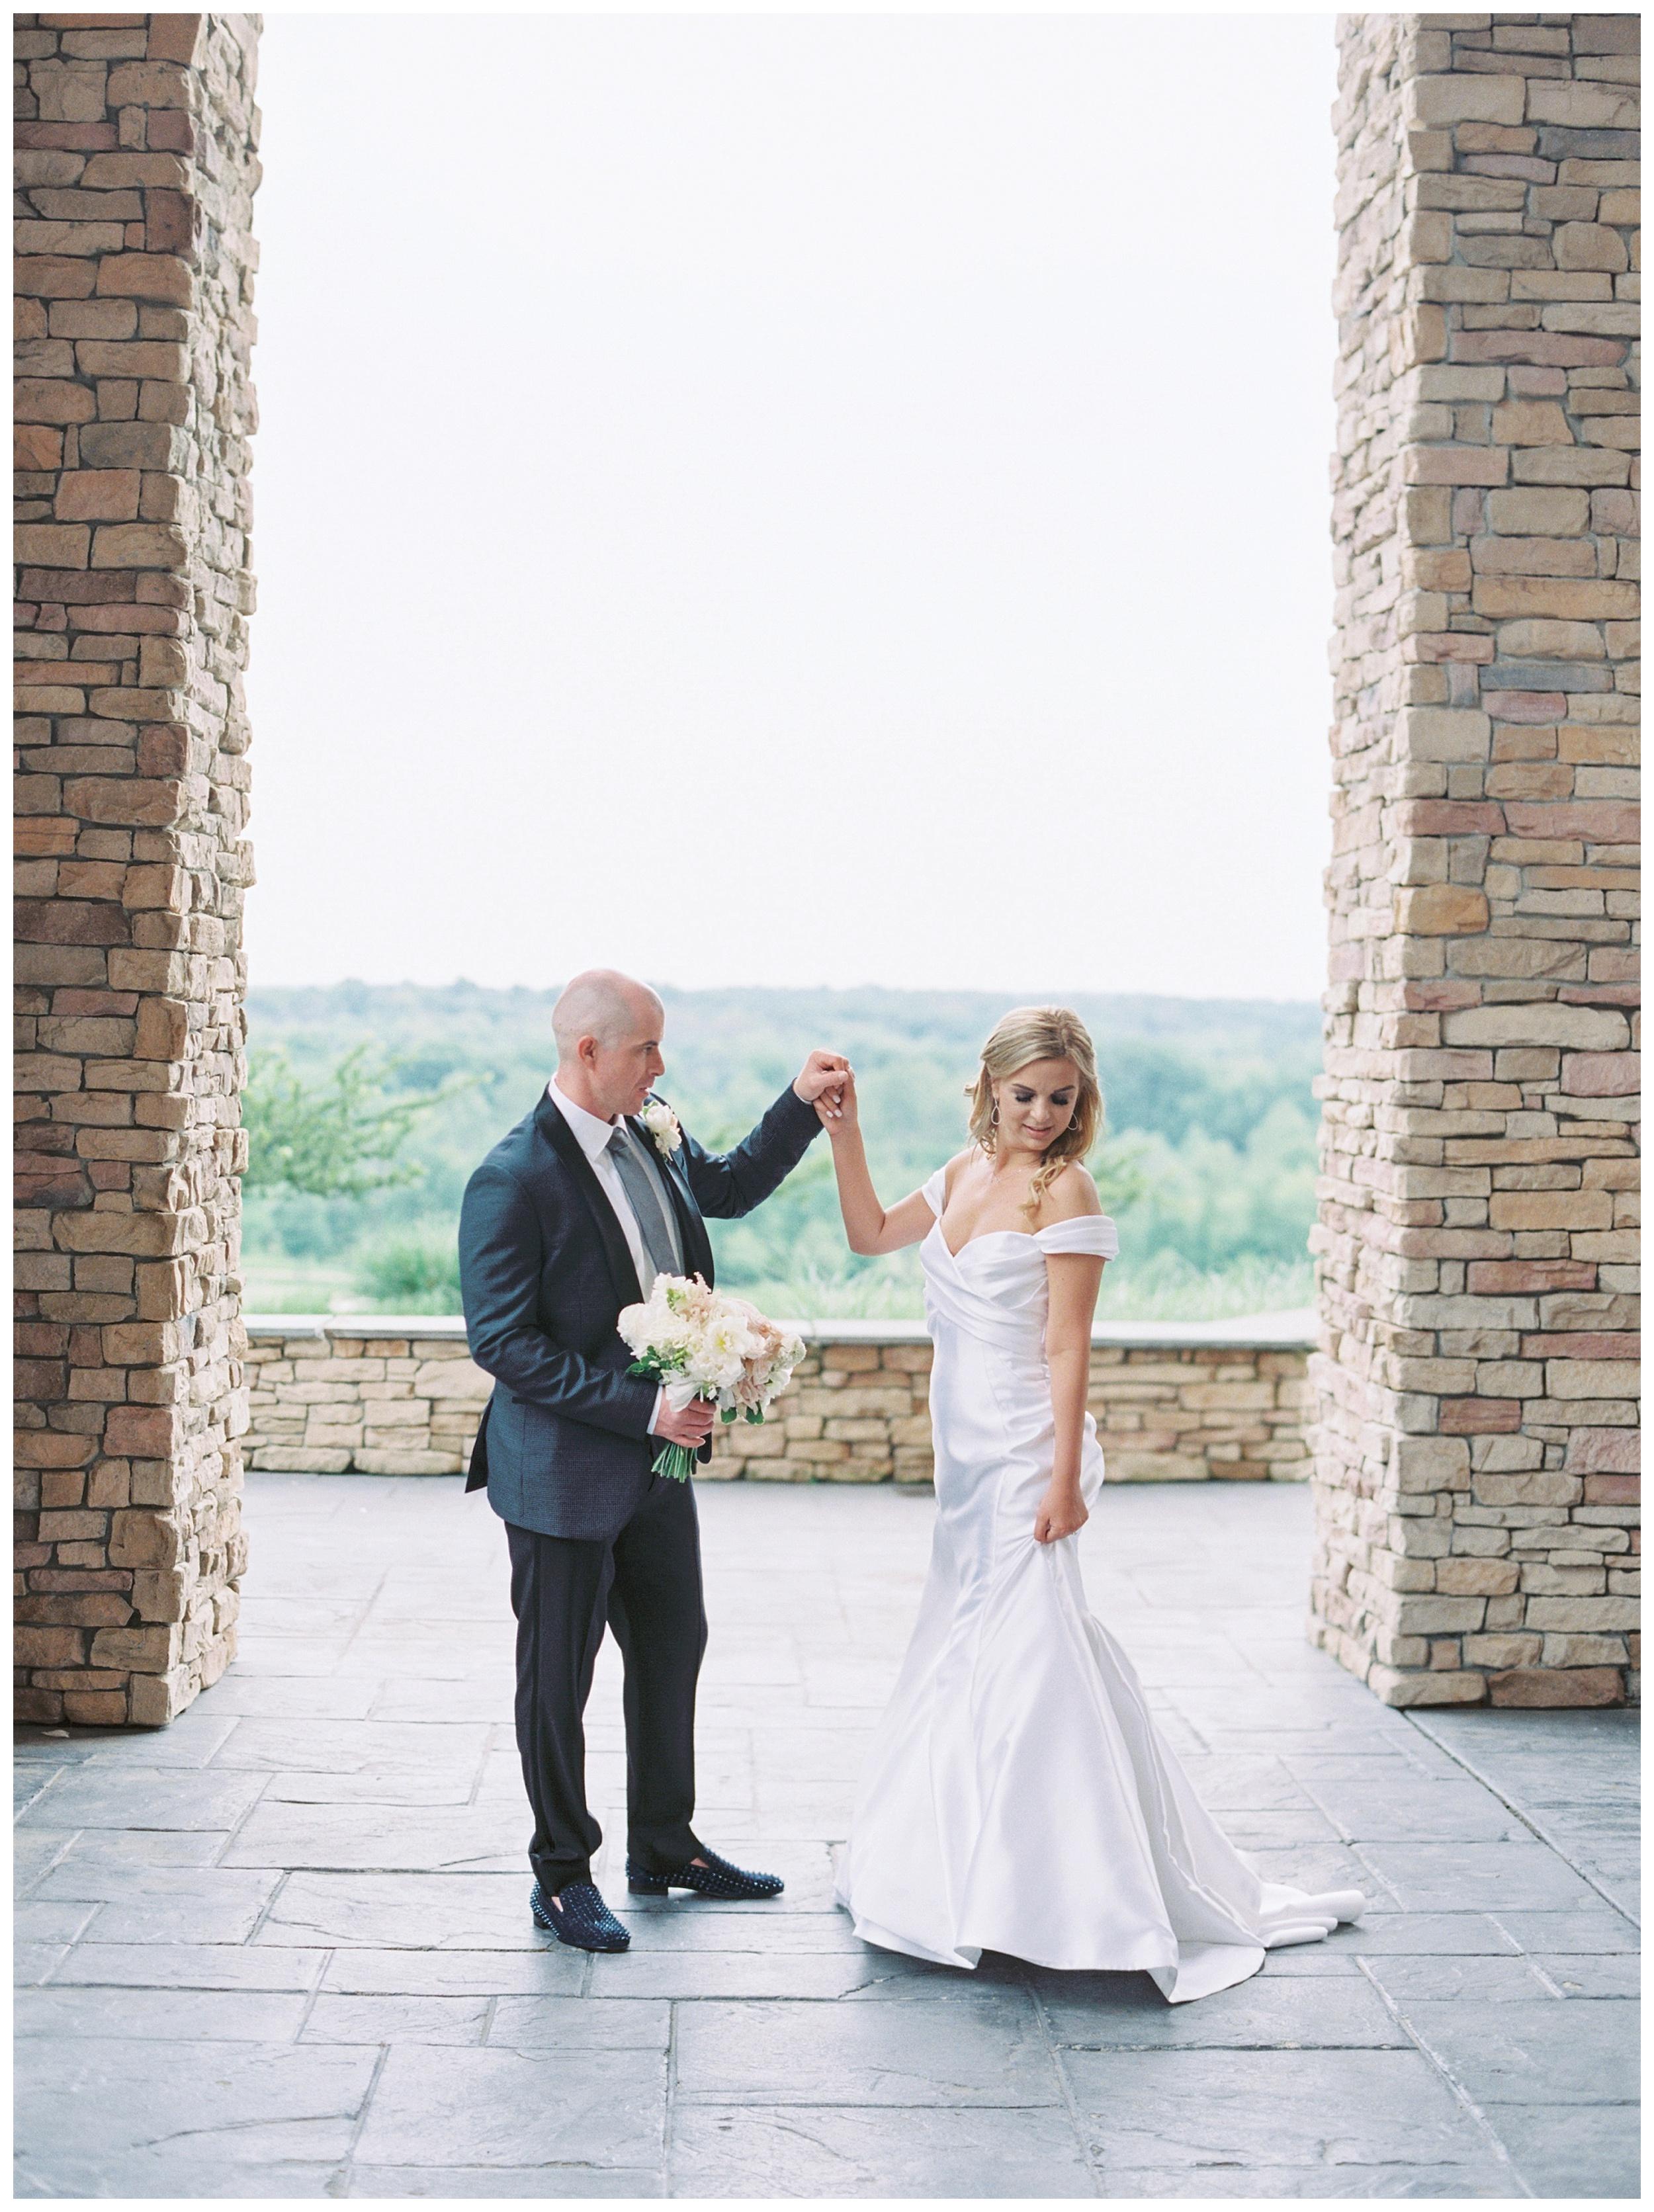 Lansdowne Resort Wedding | Virginia Film Wedding Photographer Kir Tuben_0039.jpg